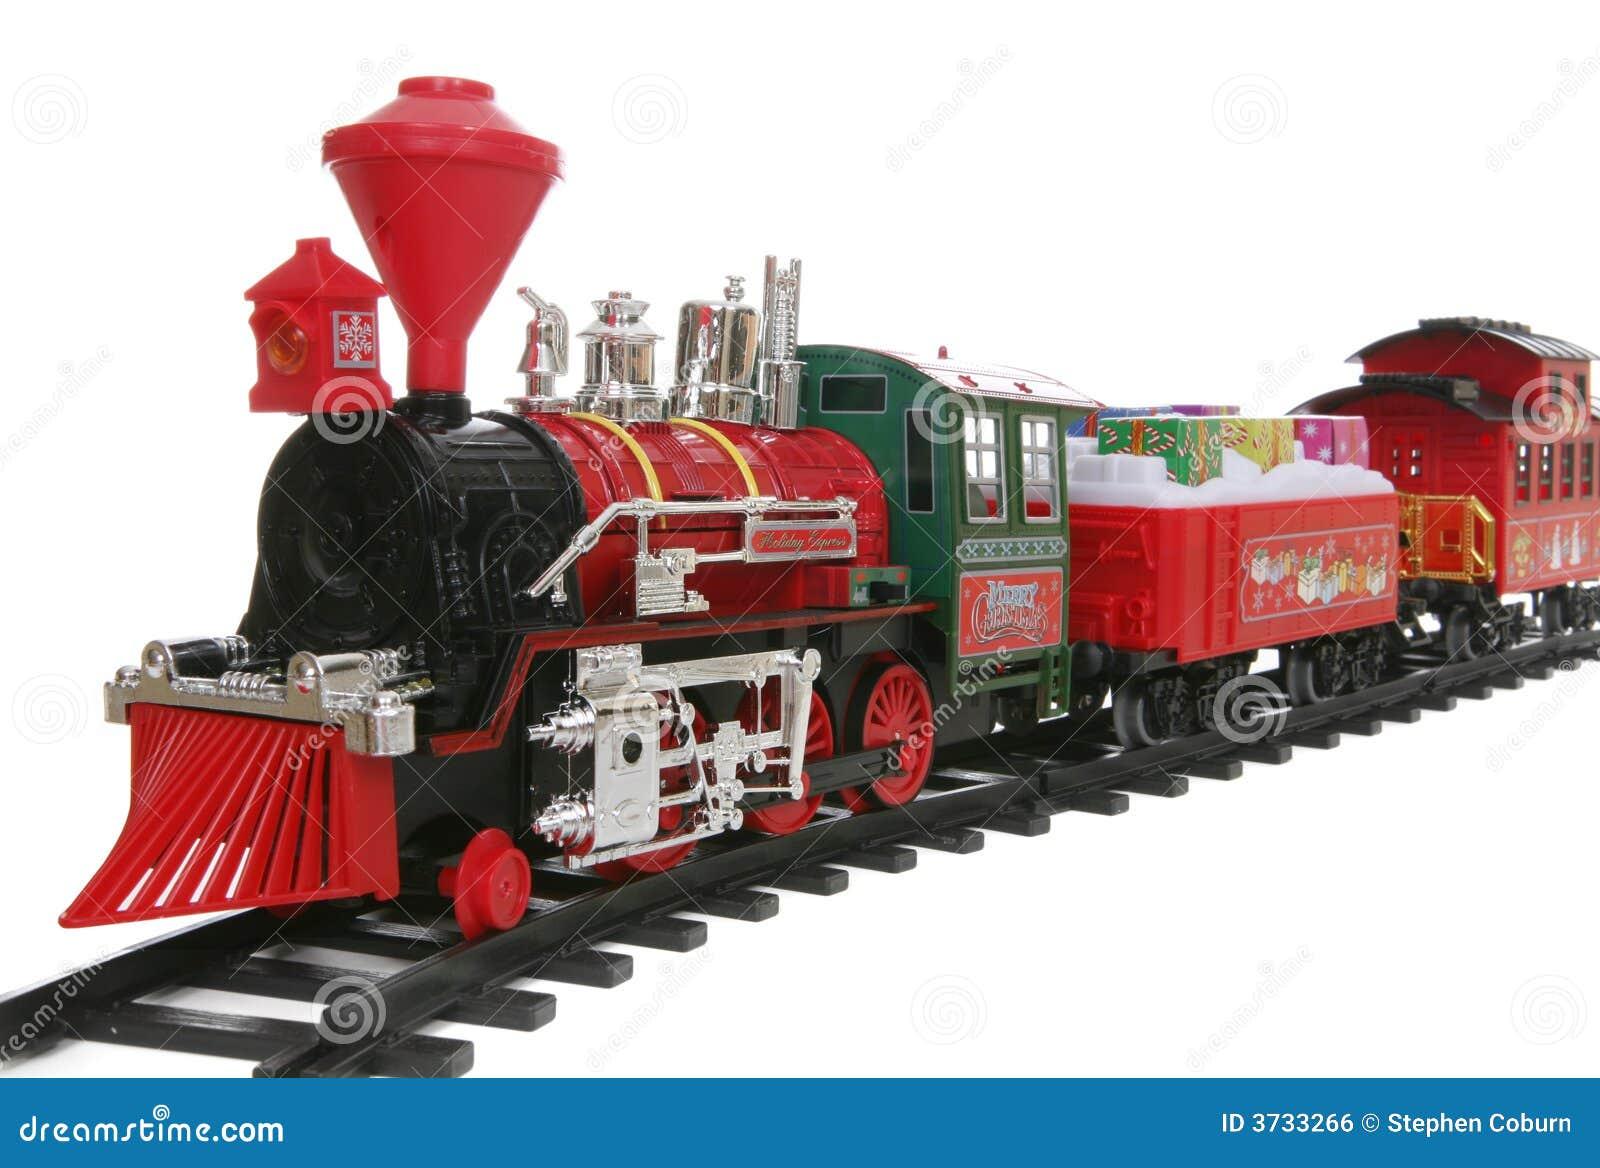 Christmas Train Clipart Christmas train royalty free